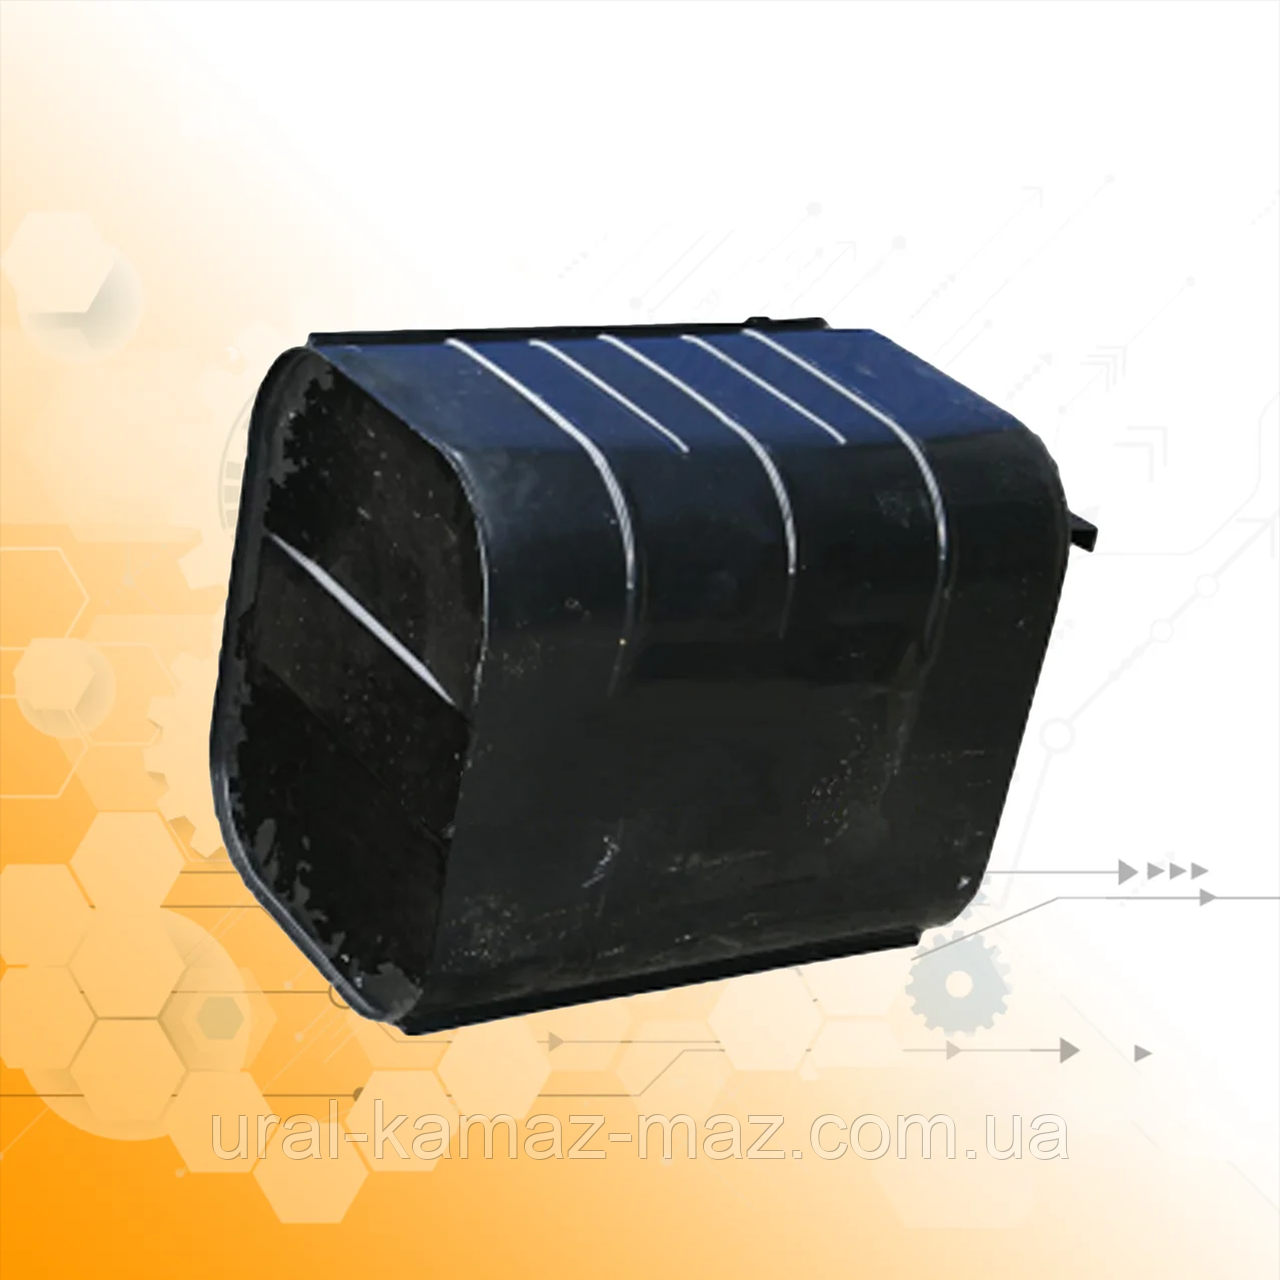 Бак топливный КрАЗ правый 250 л без крана (квадр.) 6443-1101008-20